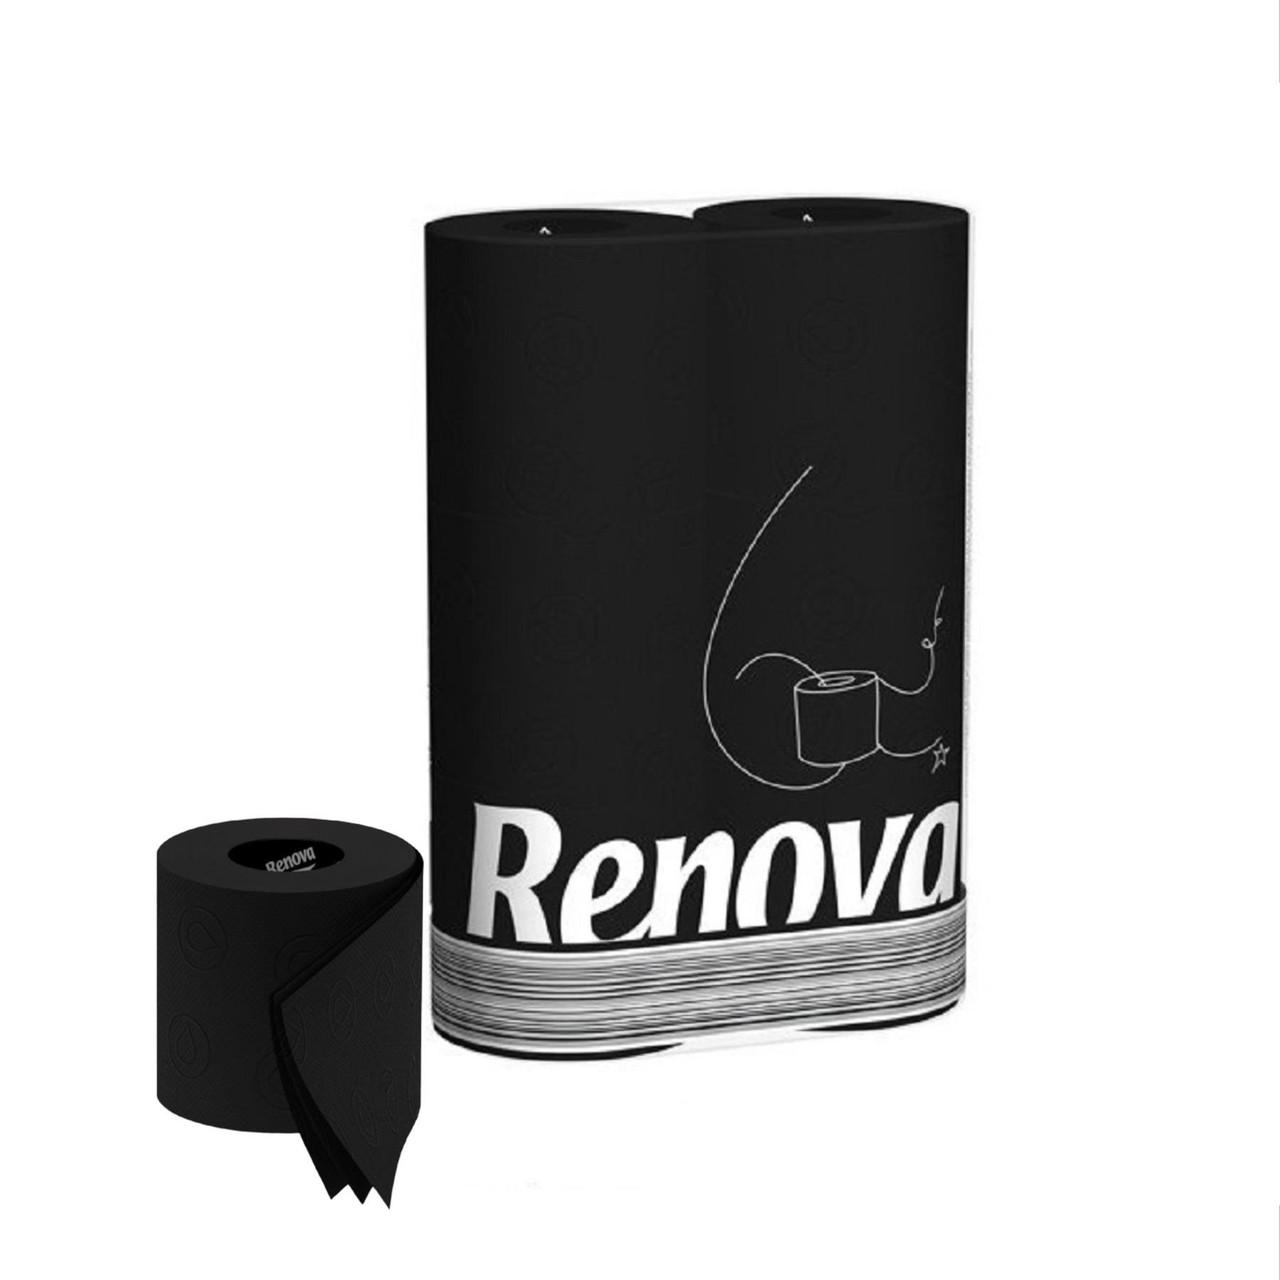 Renova Black Toilet Paper 2 Rolls Pack